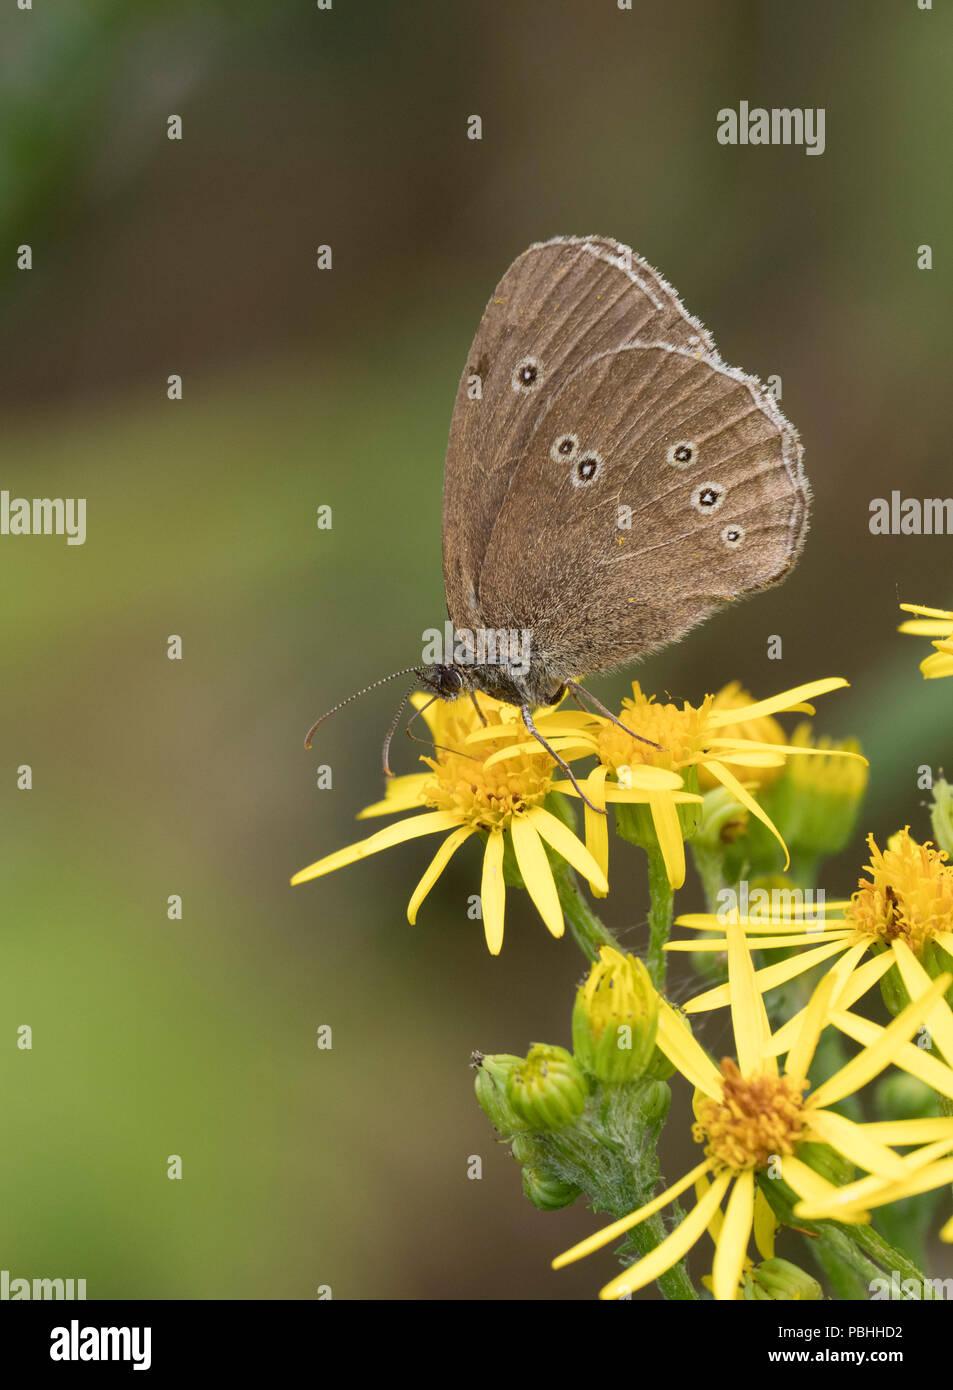 Ringlet Butterfly, Aphantopus hyperantus, single adult feeding yellow flowers of Ragwort, Senecio jacobaea, Worcestershire, UK. - Stock Image